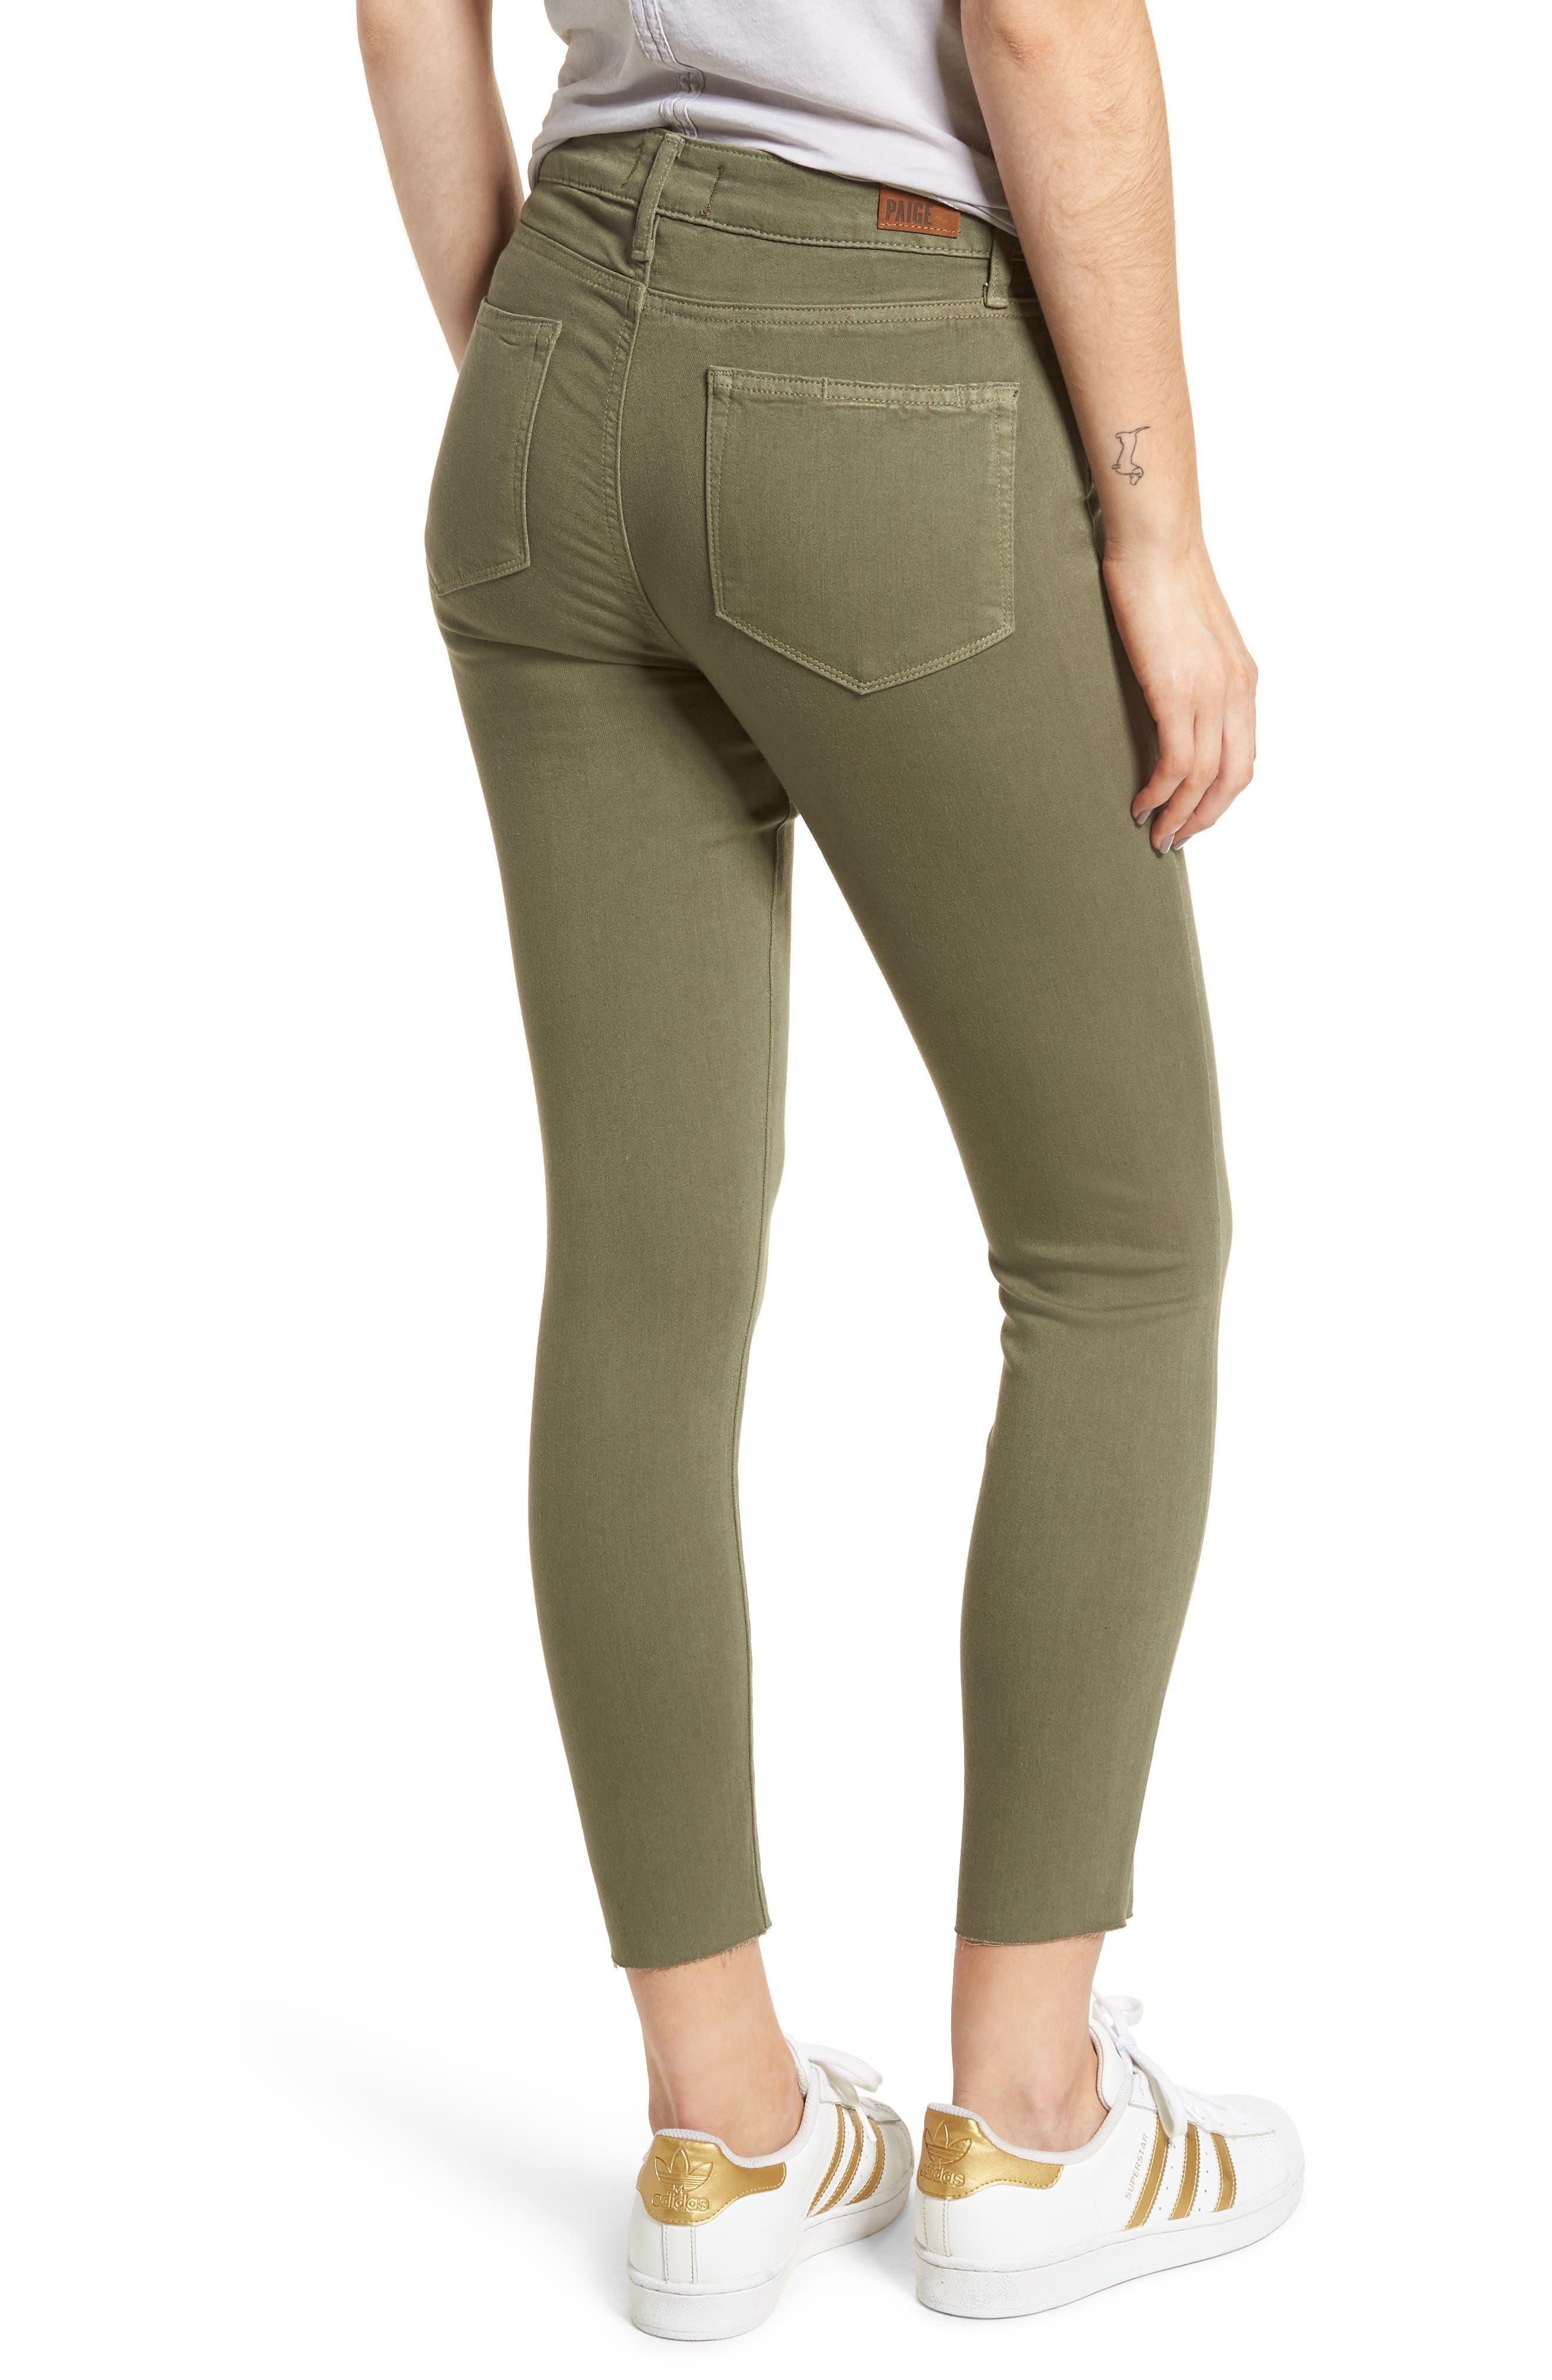 Hoxton High Waist Crop Skinny Jeans,                             Alternate thumbnail 2, color,                             Vintage Green